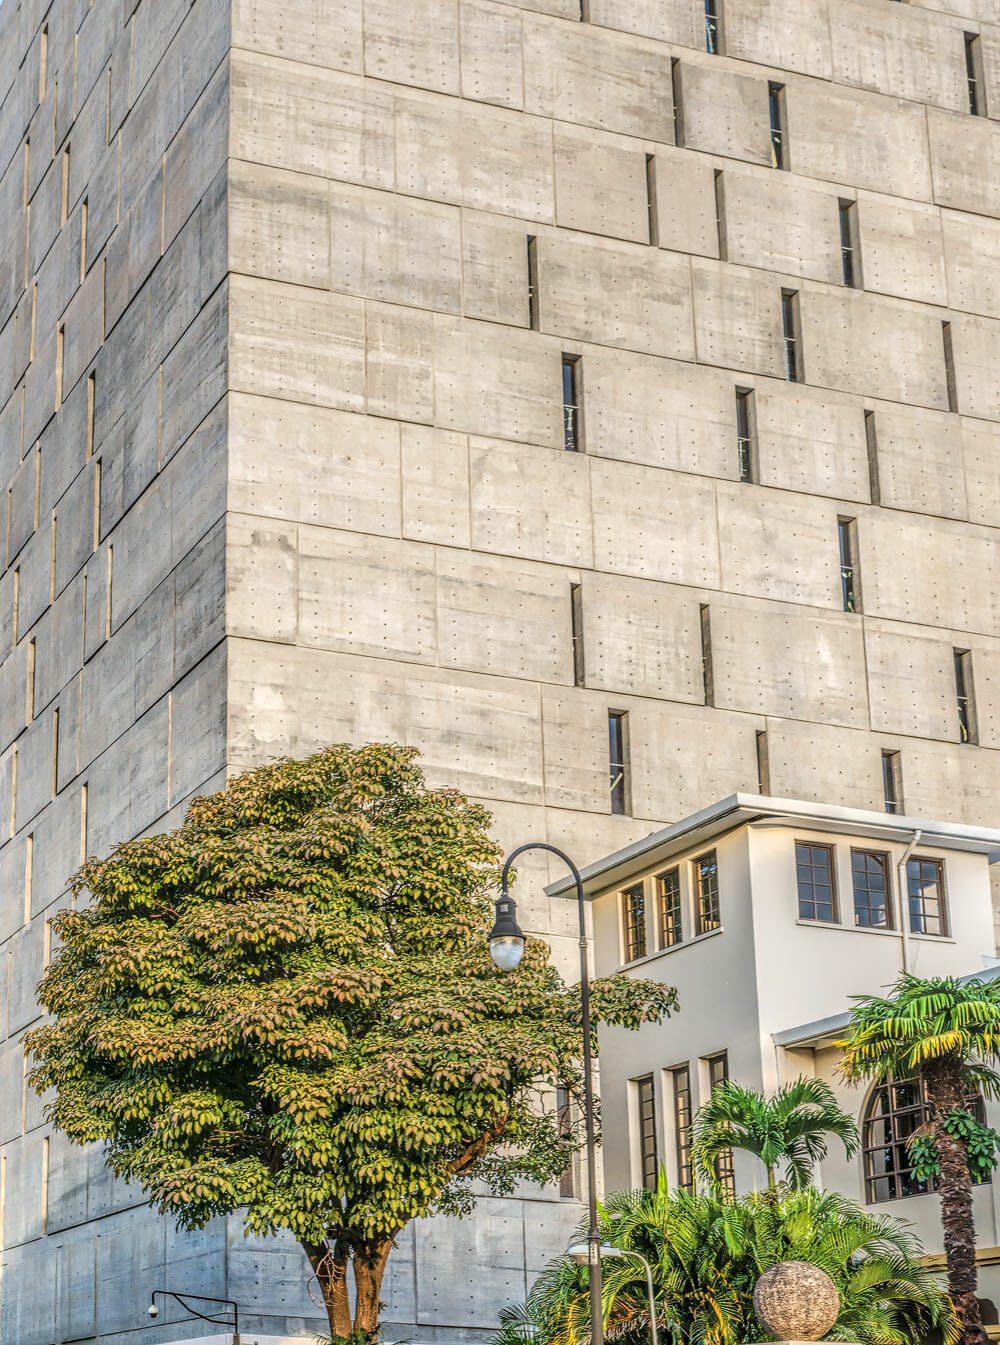 Facade of the Legislative Assembly Building in San José